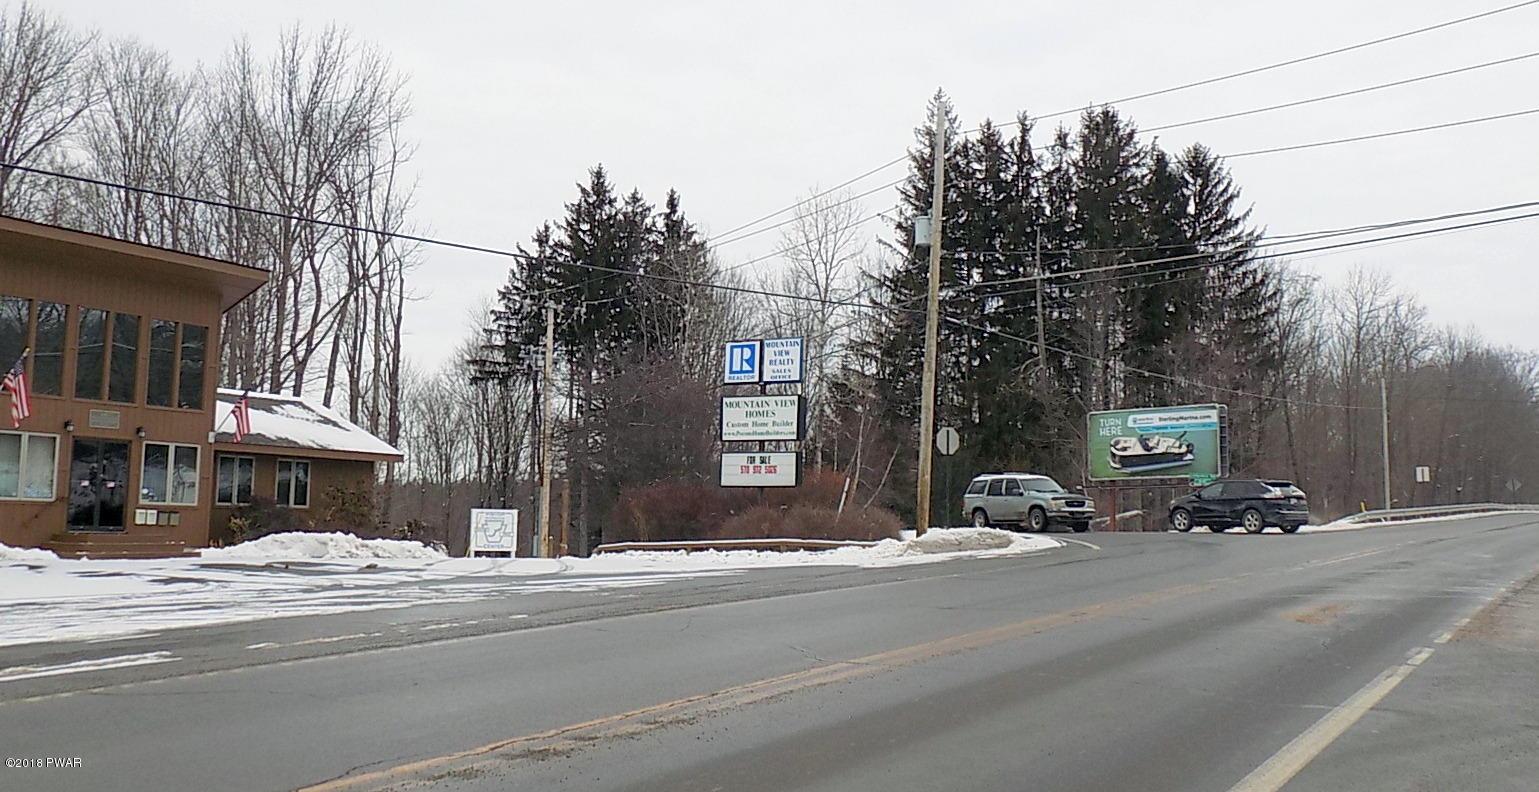 1361 Rt 507 Greentown, PA 18426 - MLS #: 18-487